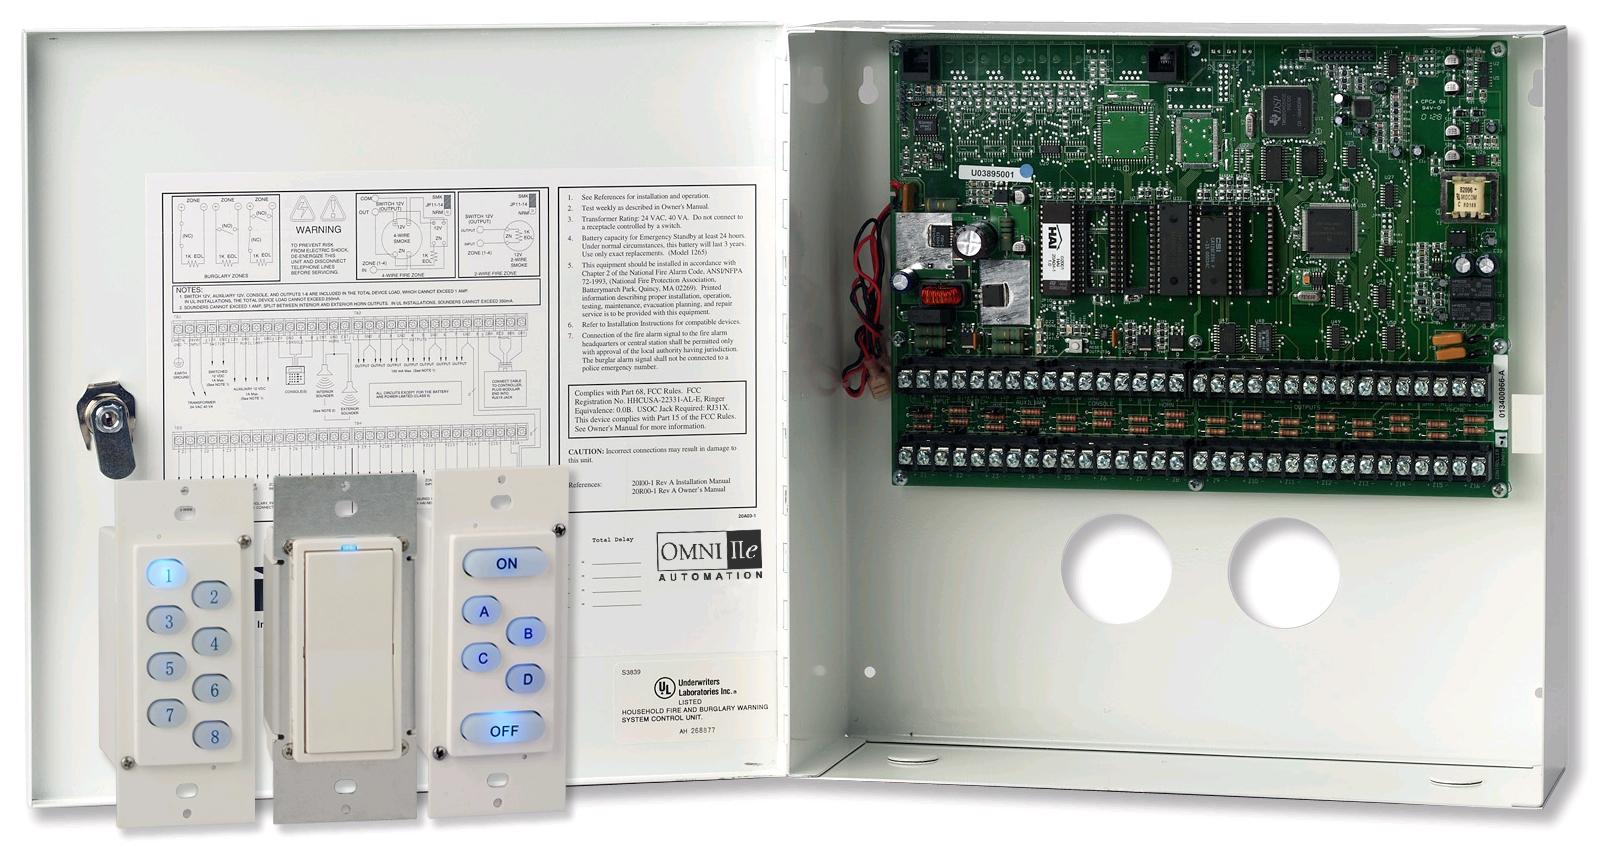 Surprising Sirkom 20A00 50 Omni Iie Controller Wiring Cloud Grayisramohammedshrineorg